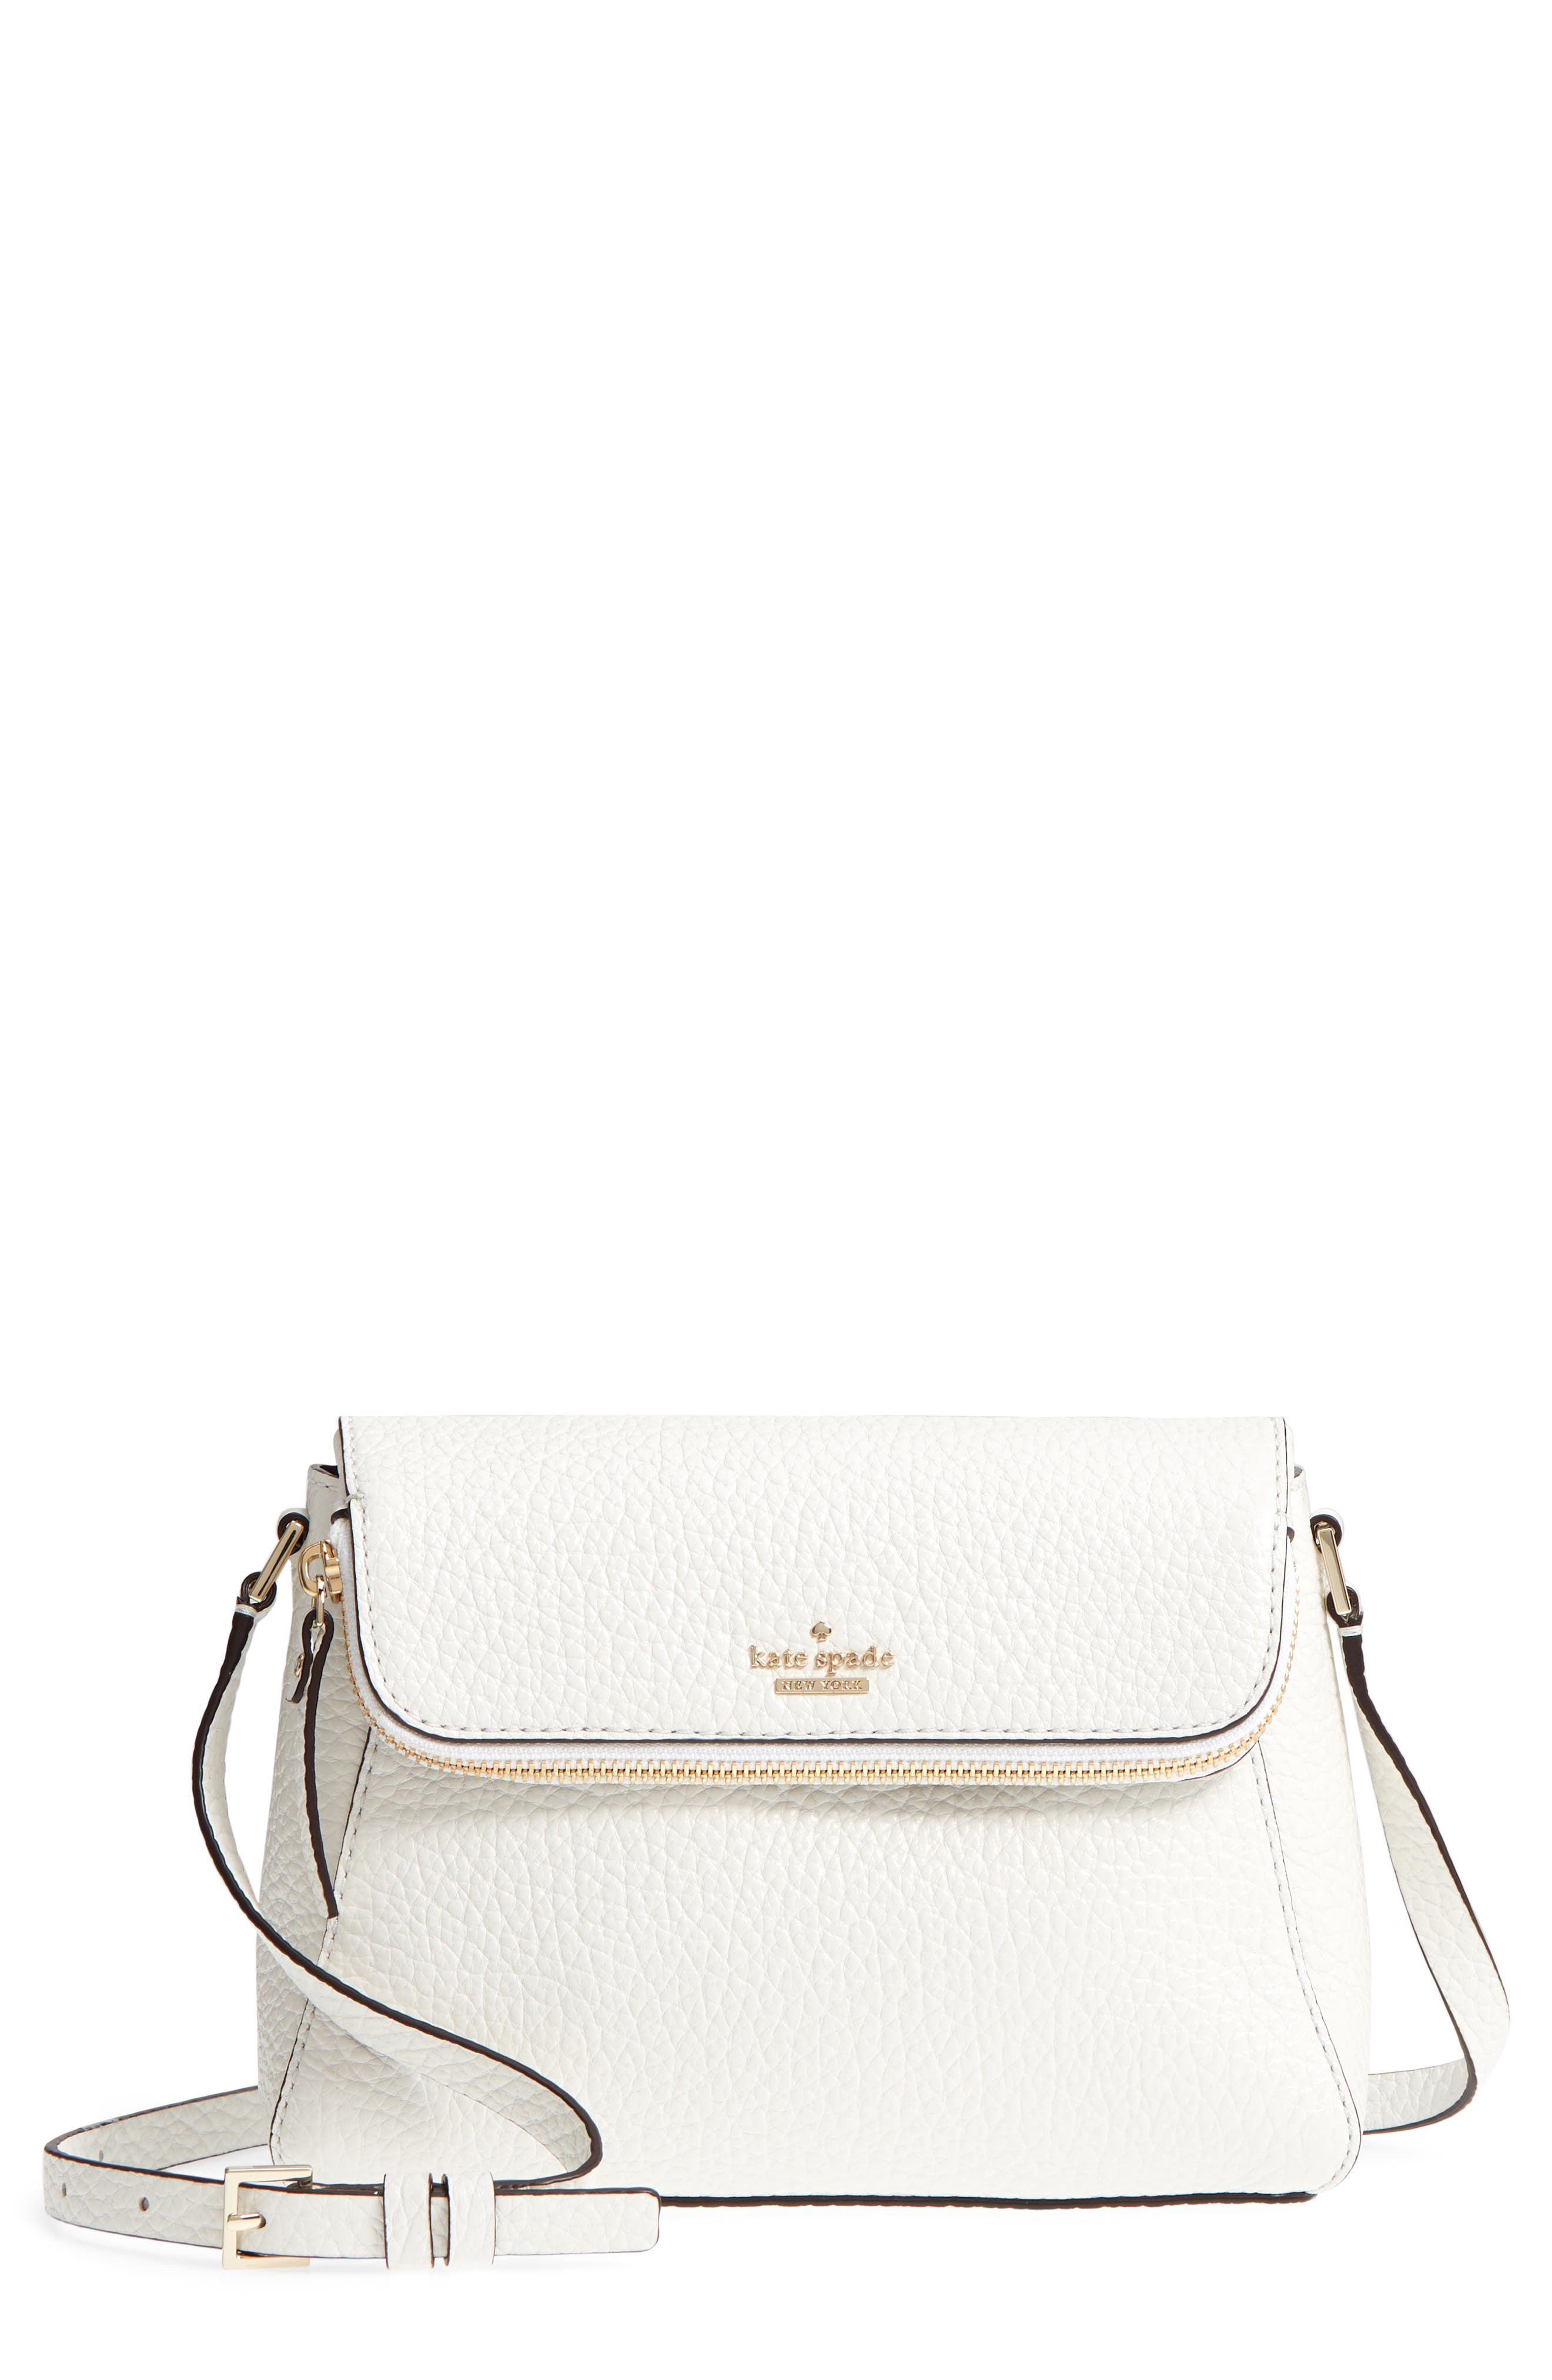 carter street - berrin leather crossbody bag,                         Main,                         color, 100